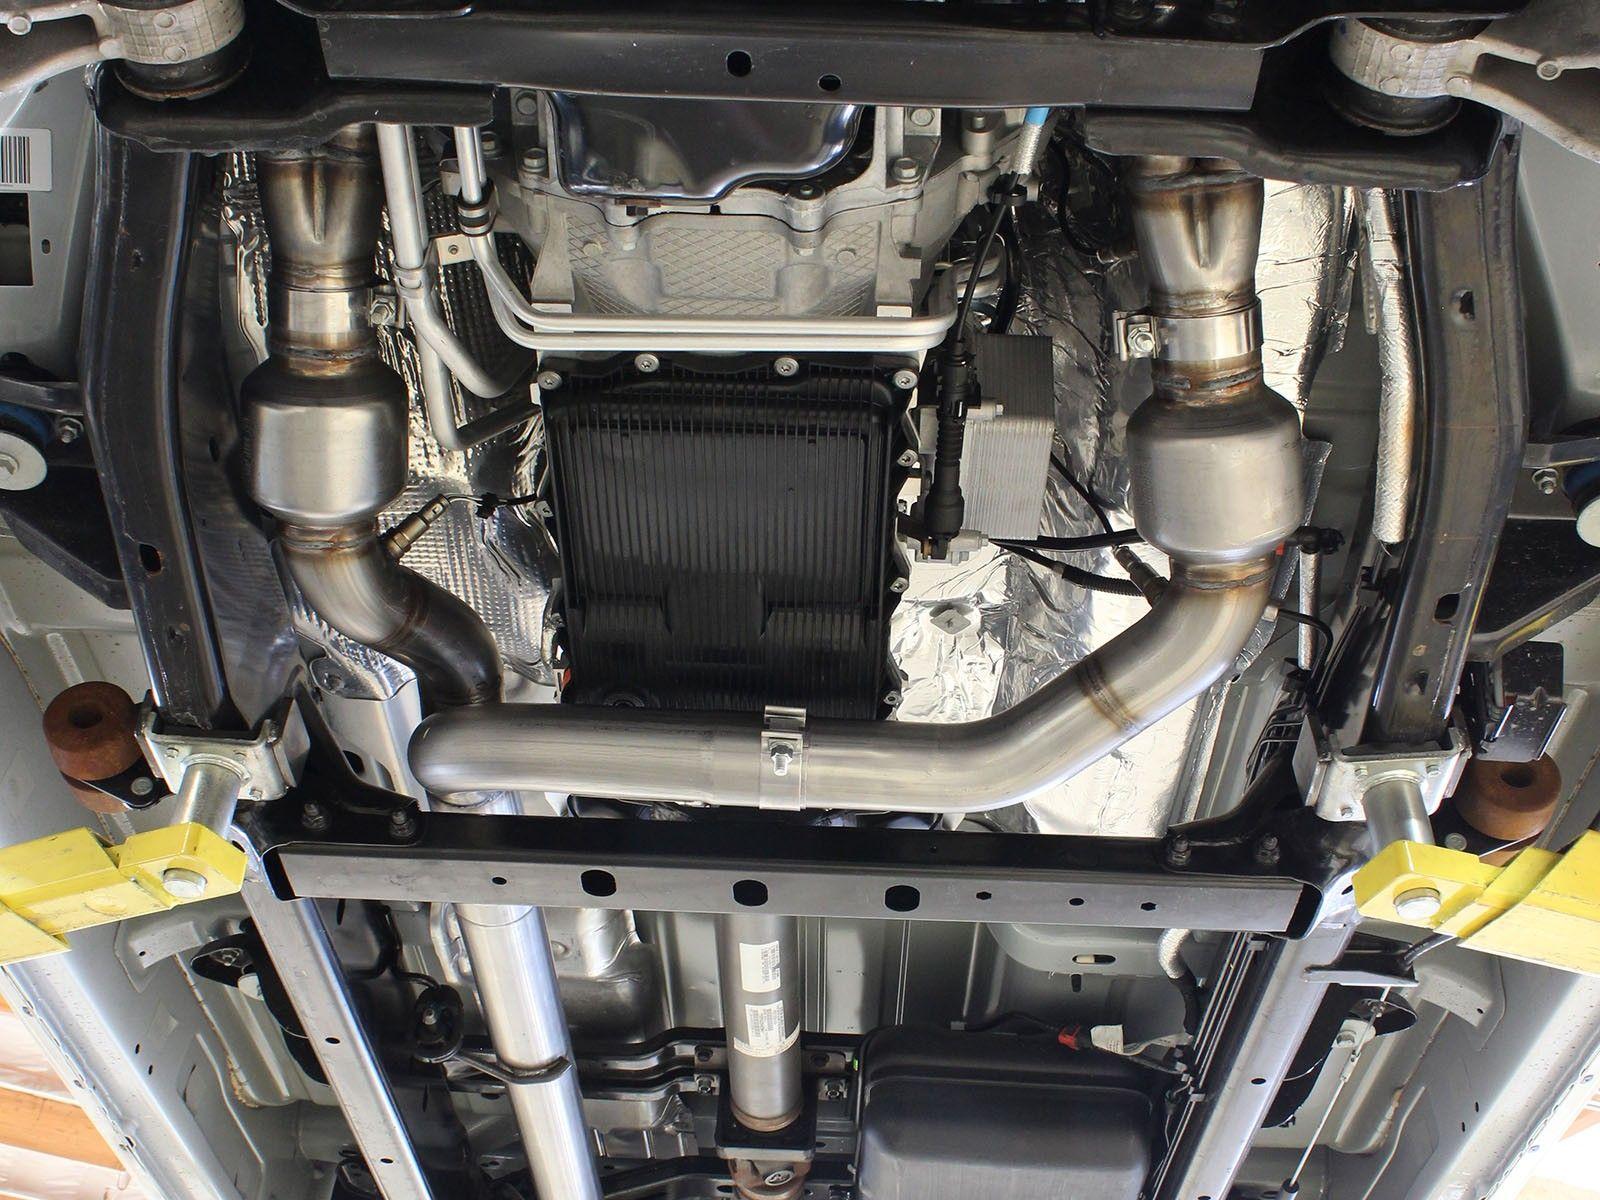 3 Best Upgrades Performance Mods For Dodge Ram 1500 In 2020 21 Dodge Ram 1500 Dodge Ram 1500 Accessories Ram 1500